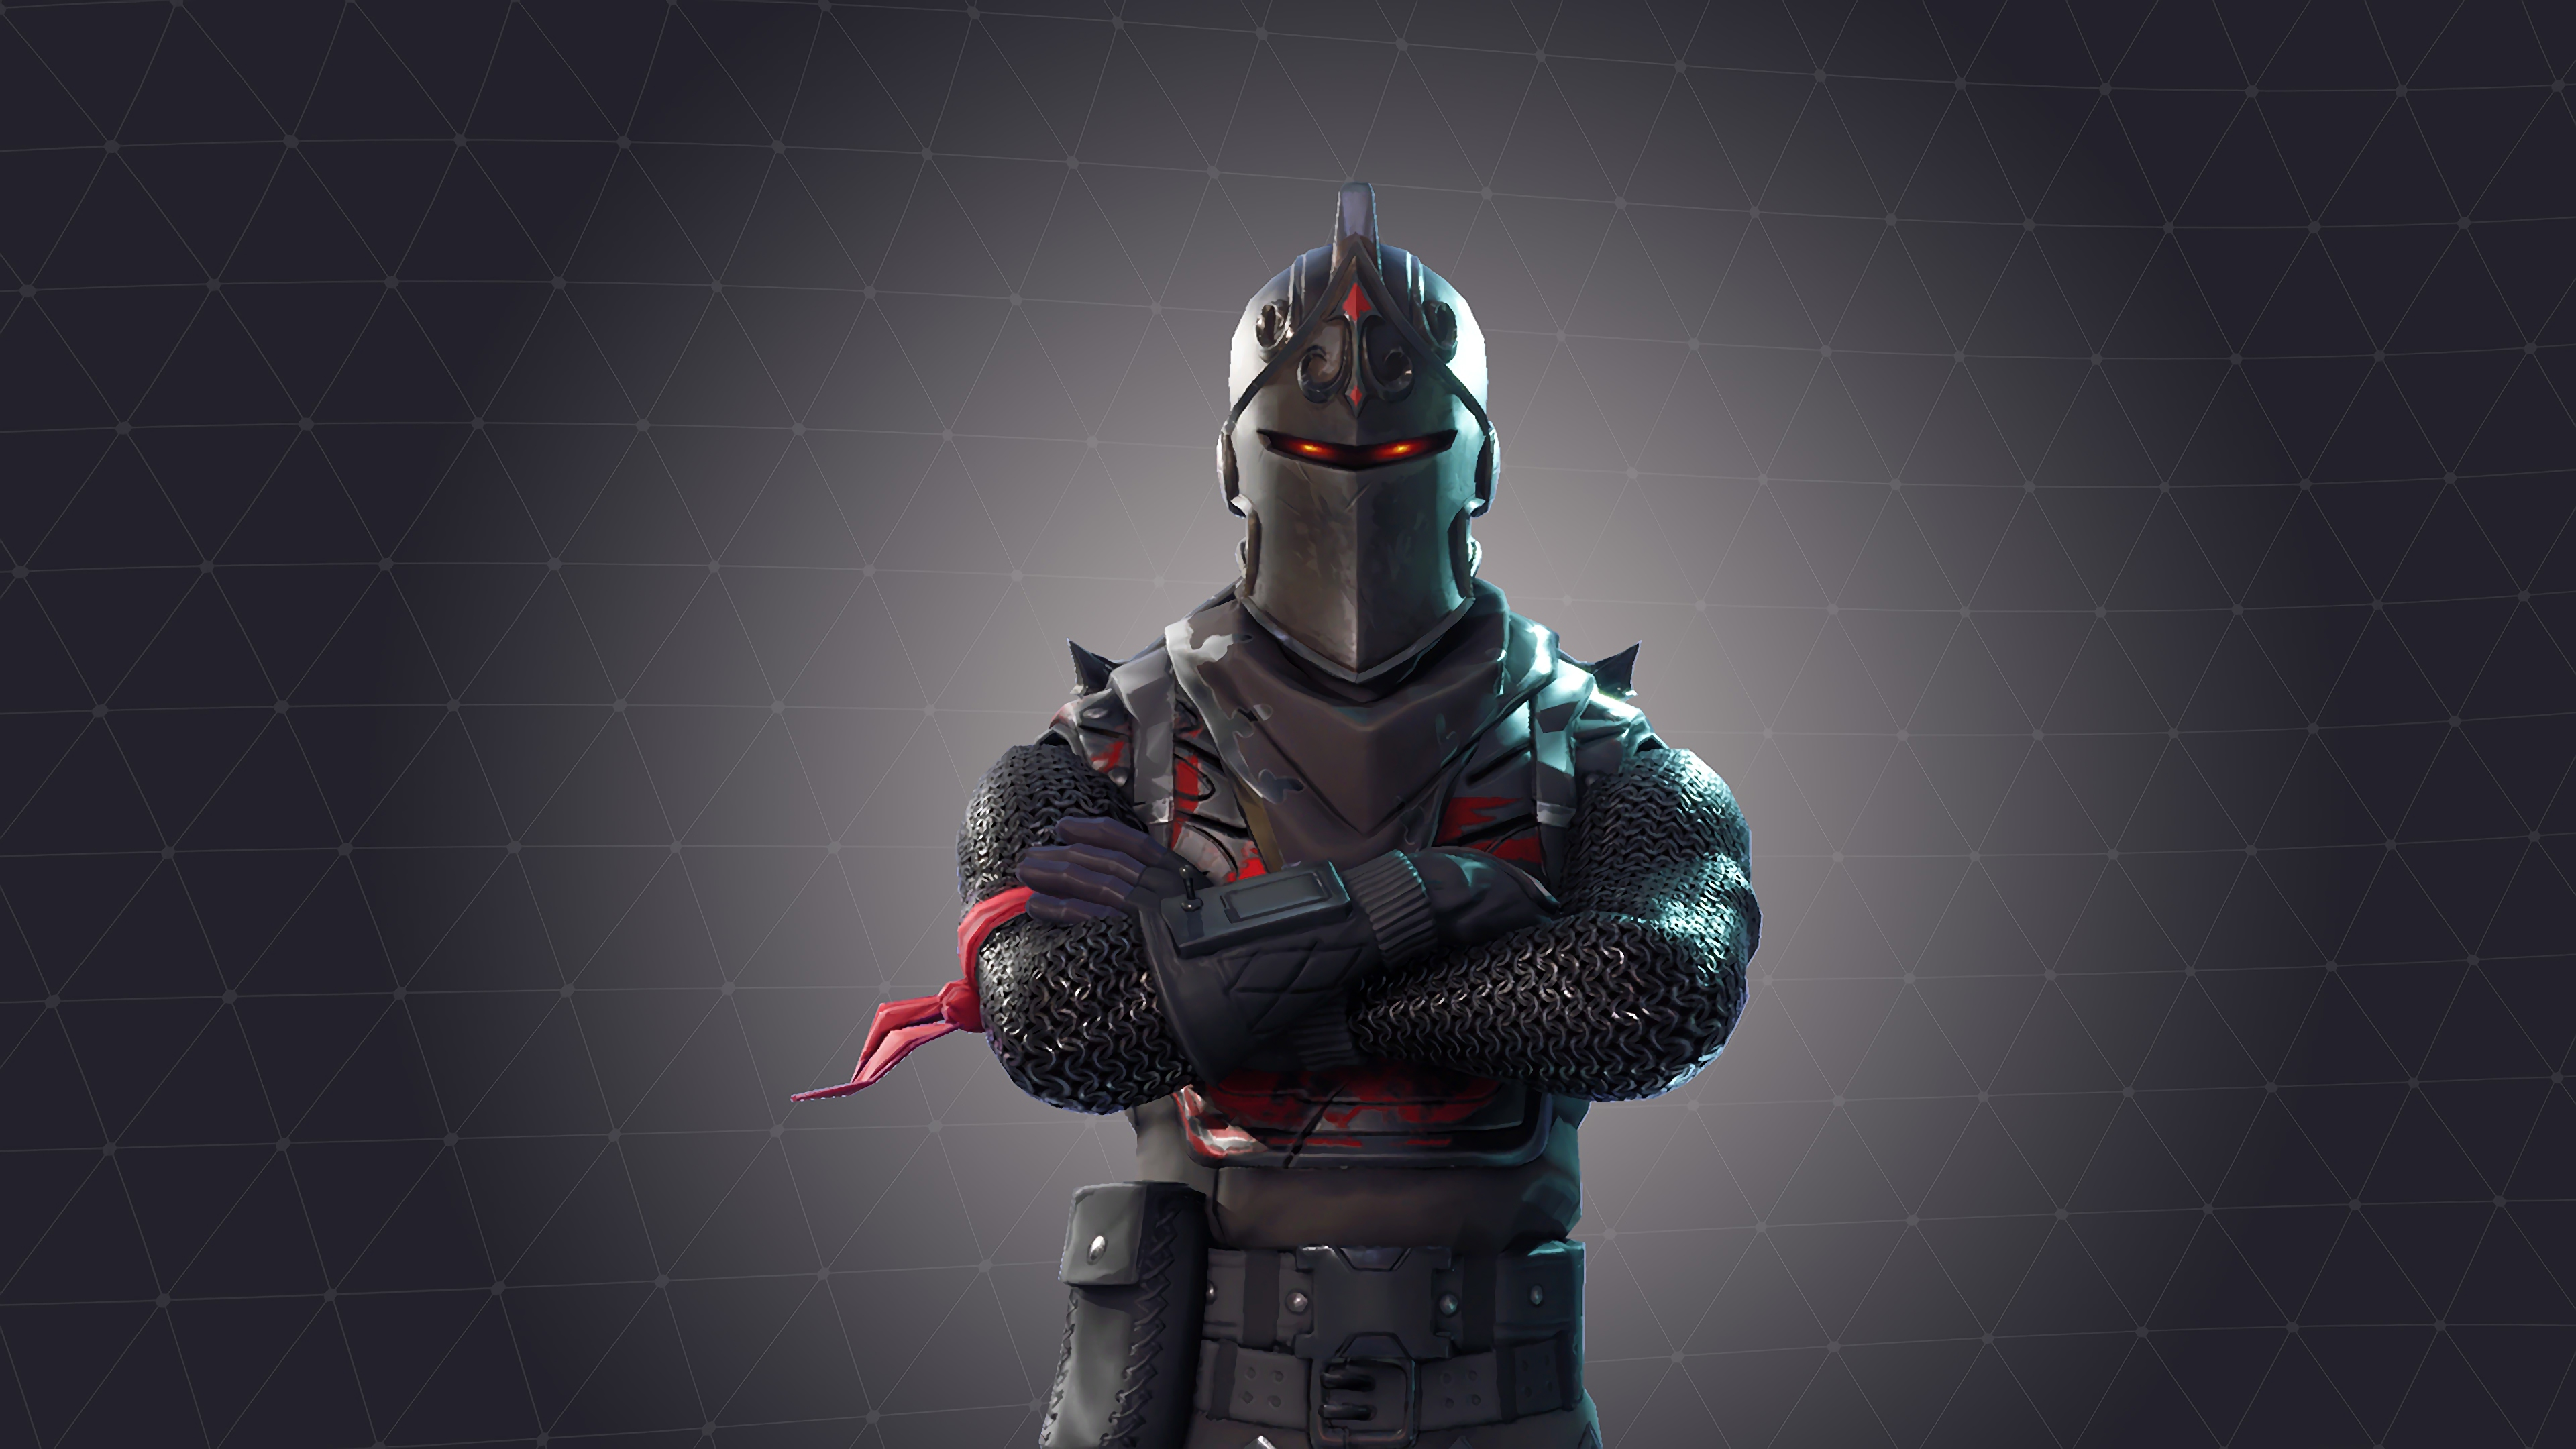 Fortnite Battle Royale Black Knight 4K 10326 3840x2160